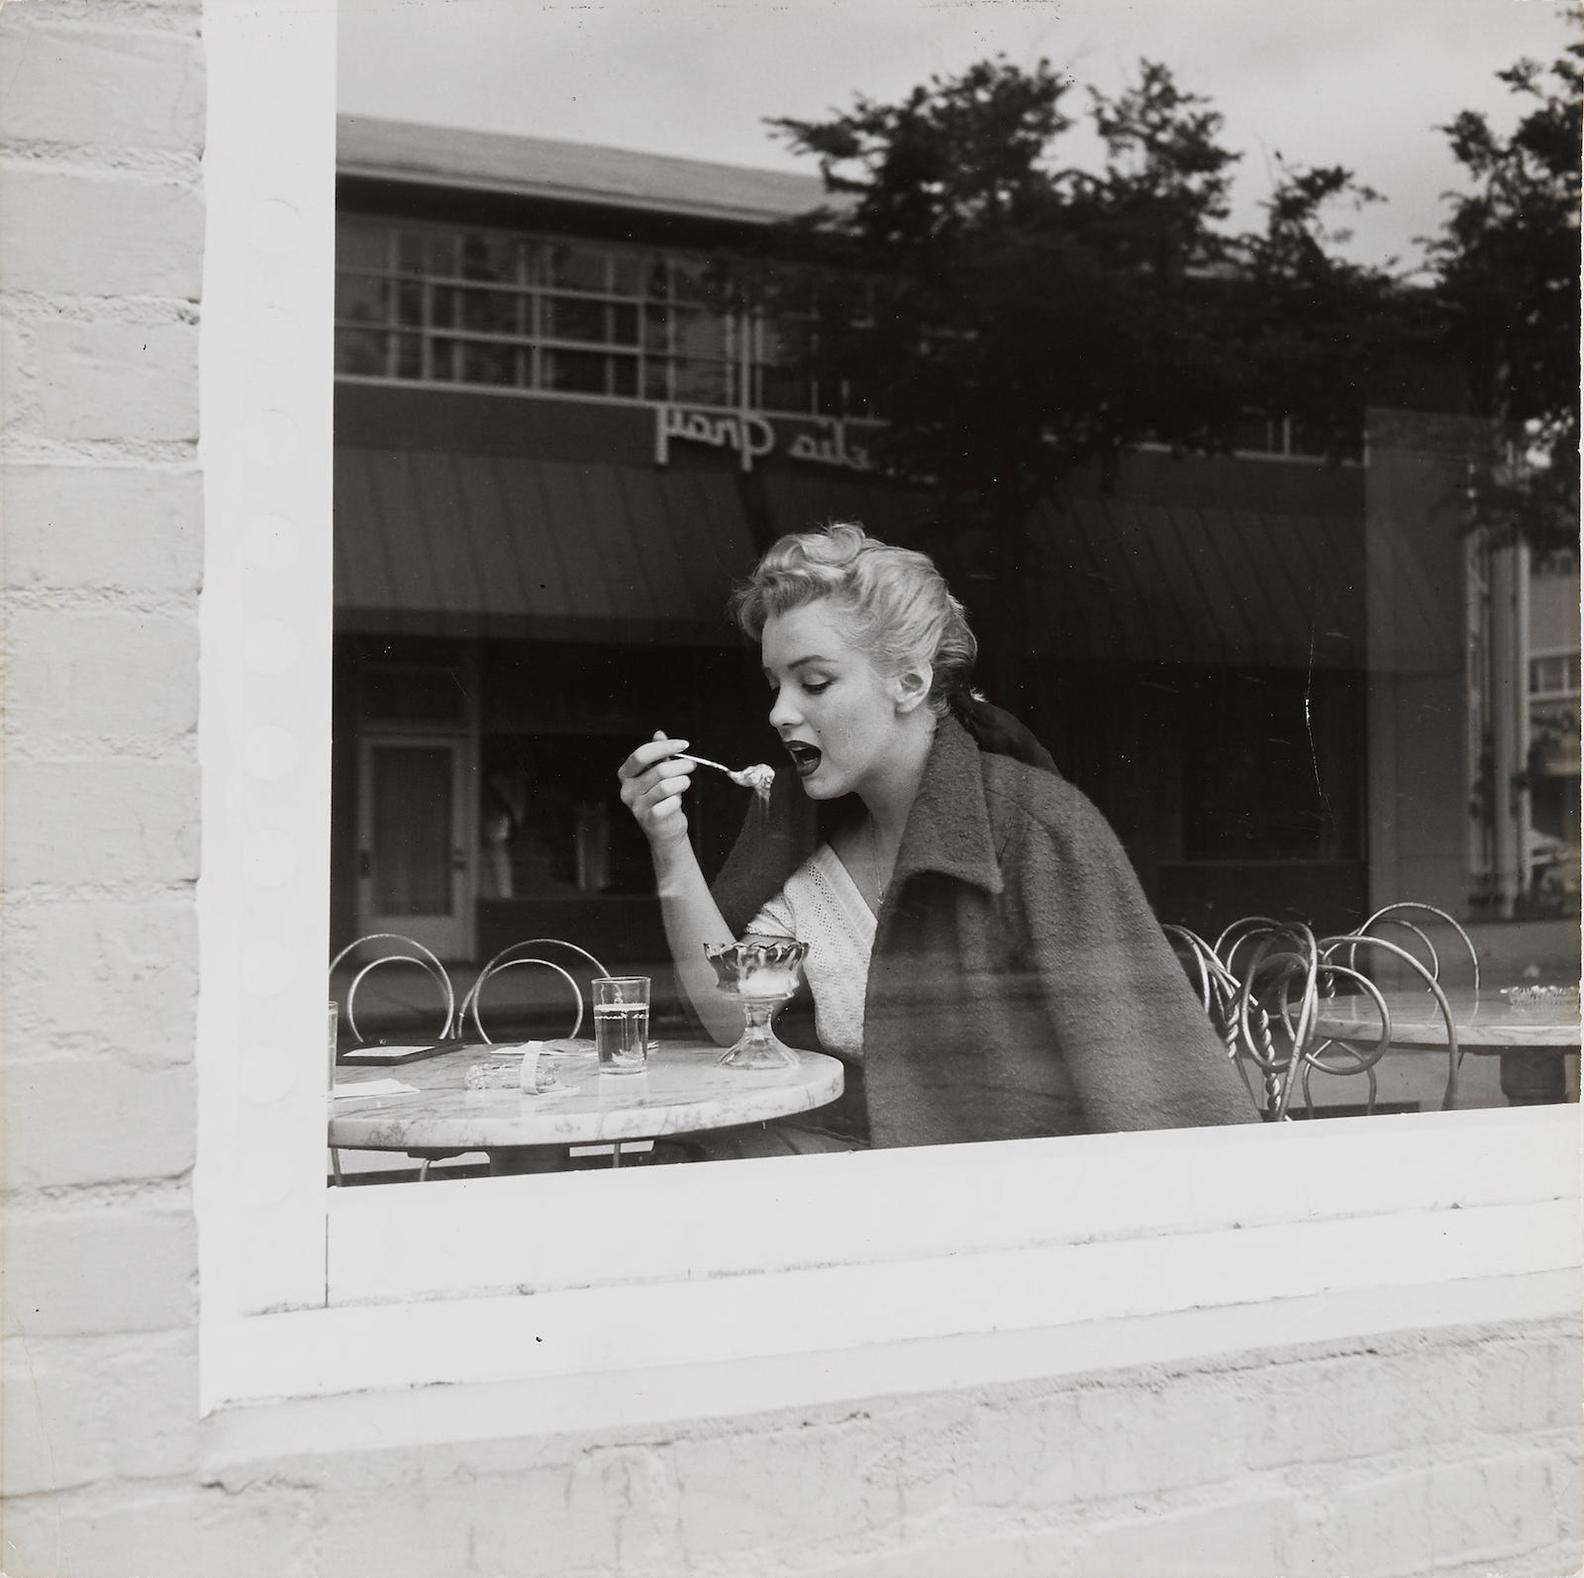 Andre De Dienes-Marilyn Eating An Ice-Cream Sundae-1953